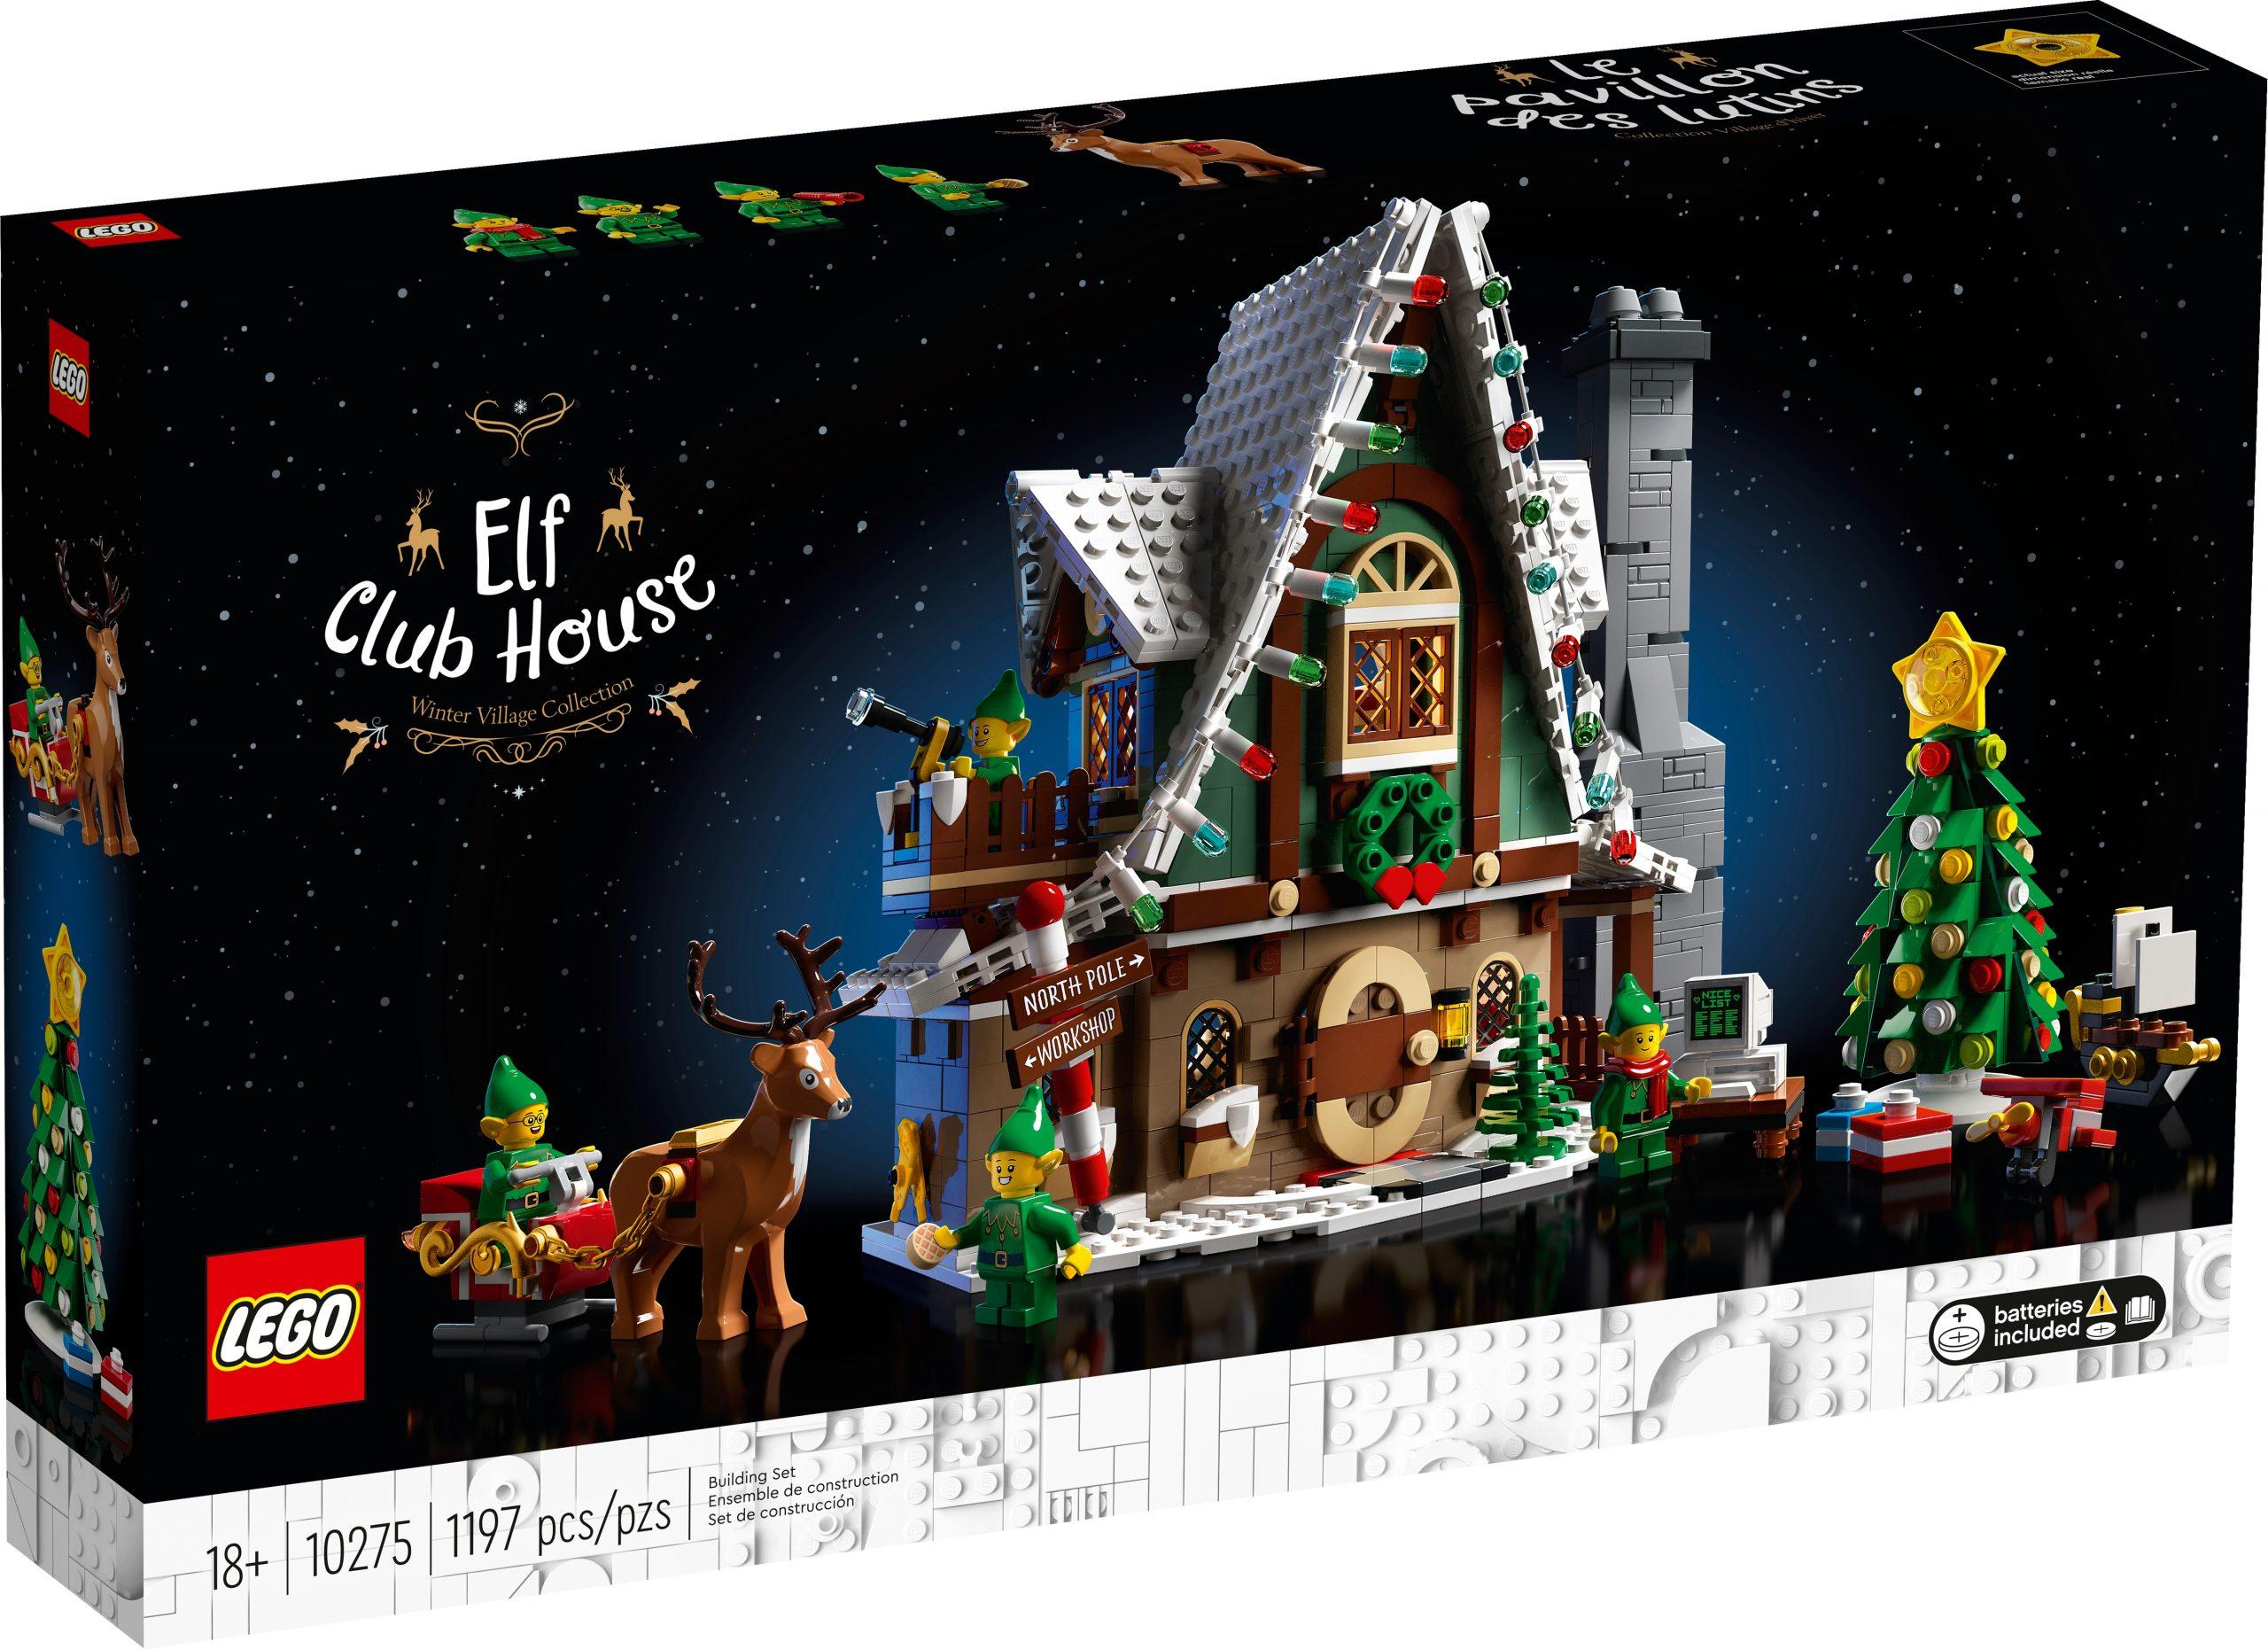 lego 10275 elfen klubhaus scaled